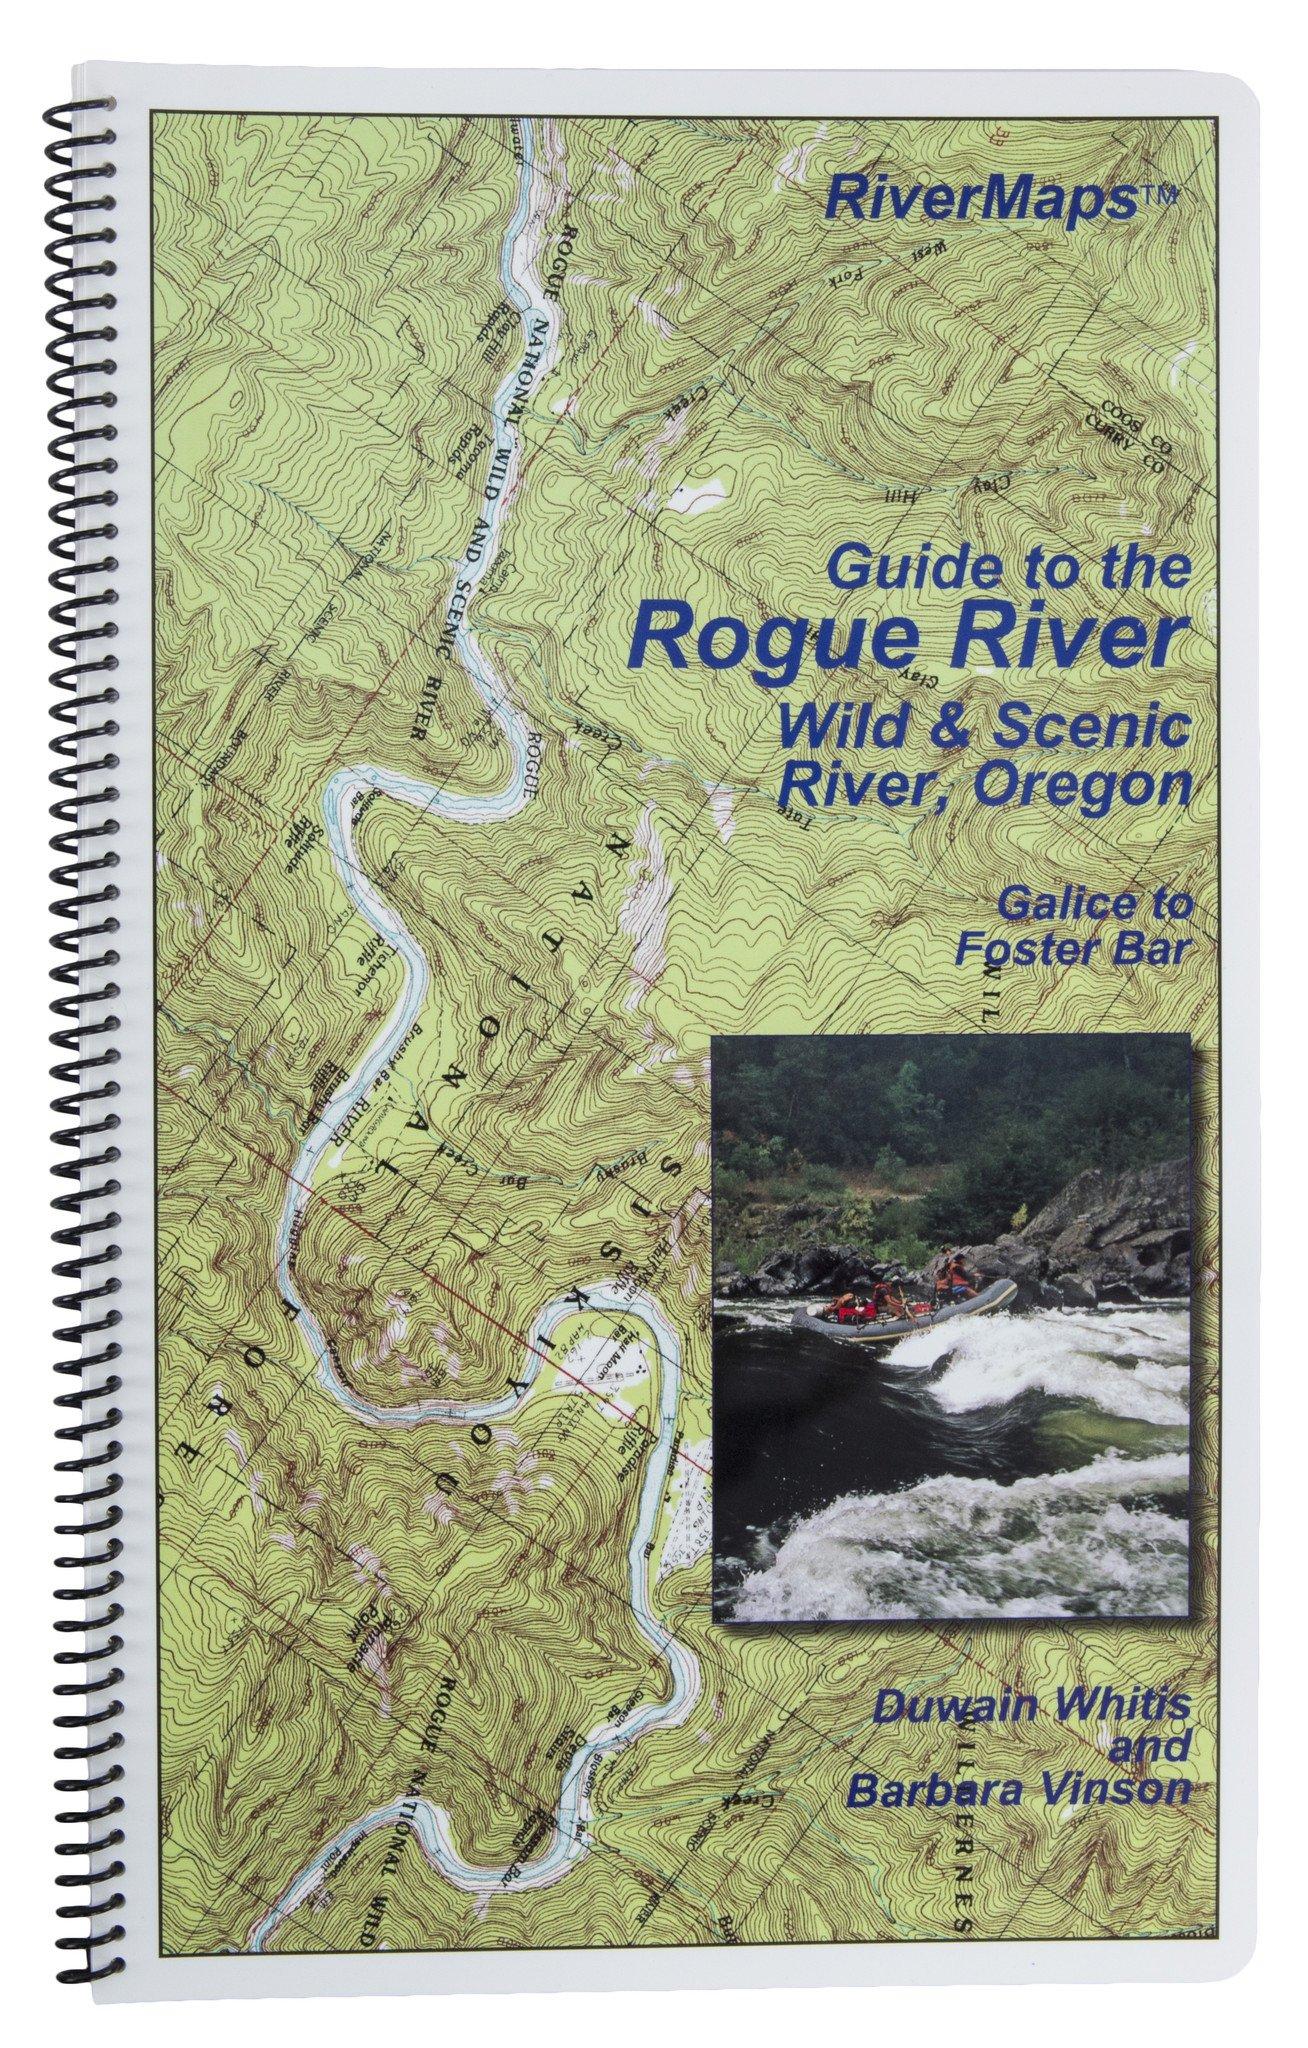 RiverMaps - Guide to the Rogue River Wild & Scenic River, Oregon Second Edition